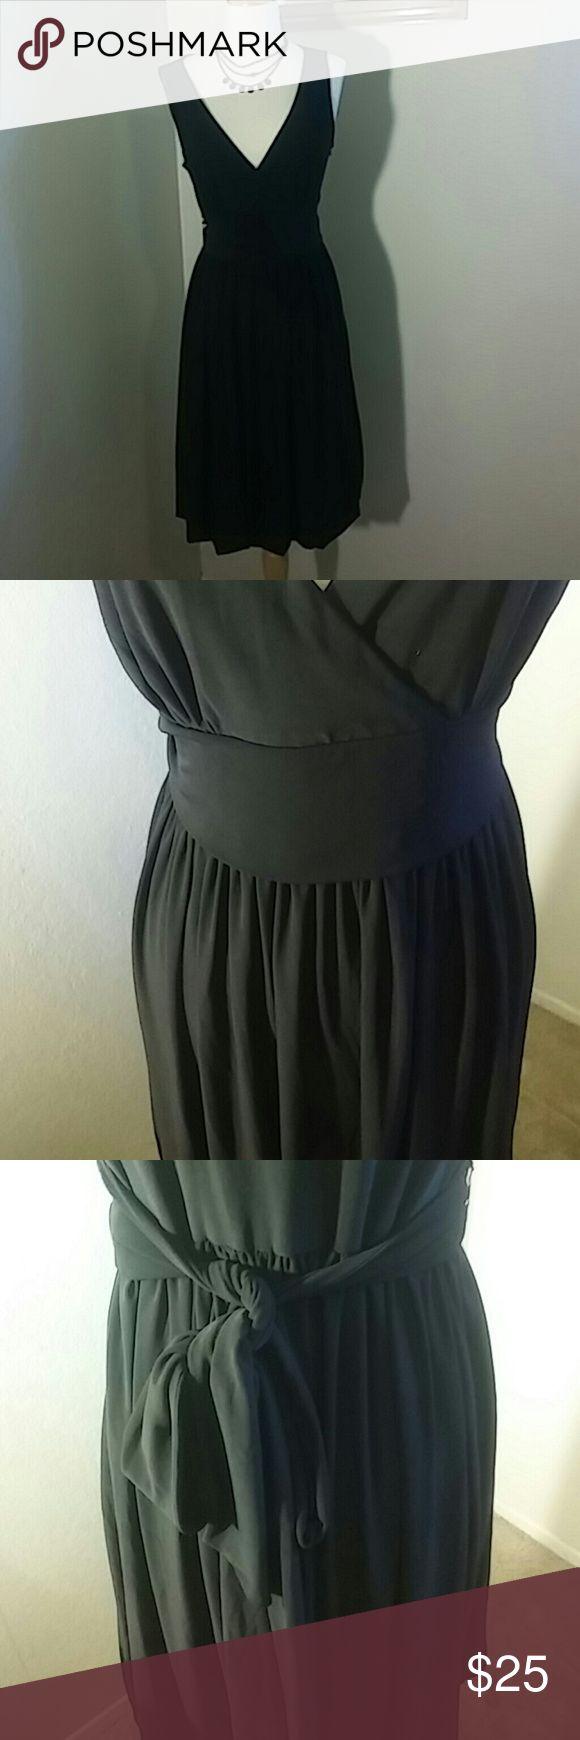 Selling this Fun and flirty Little Black Dress in my Poshmark closet! My username is: daphnesduds. #shopmycloset #poshmark #fashion #shopping #style #forsale #Ann Taylr Loft #Dresses & Skirts